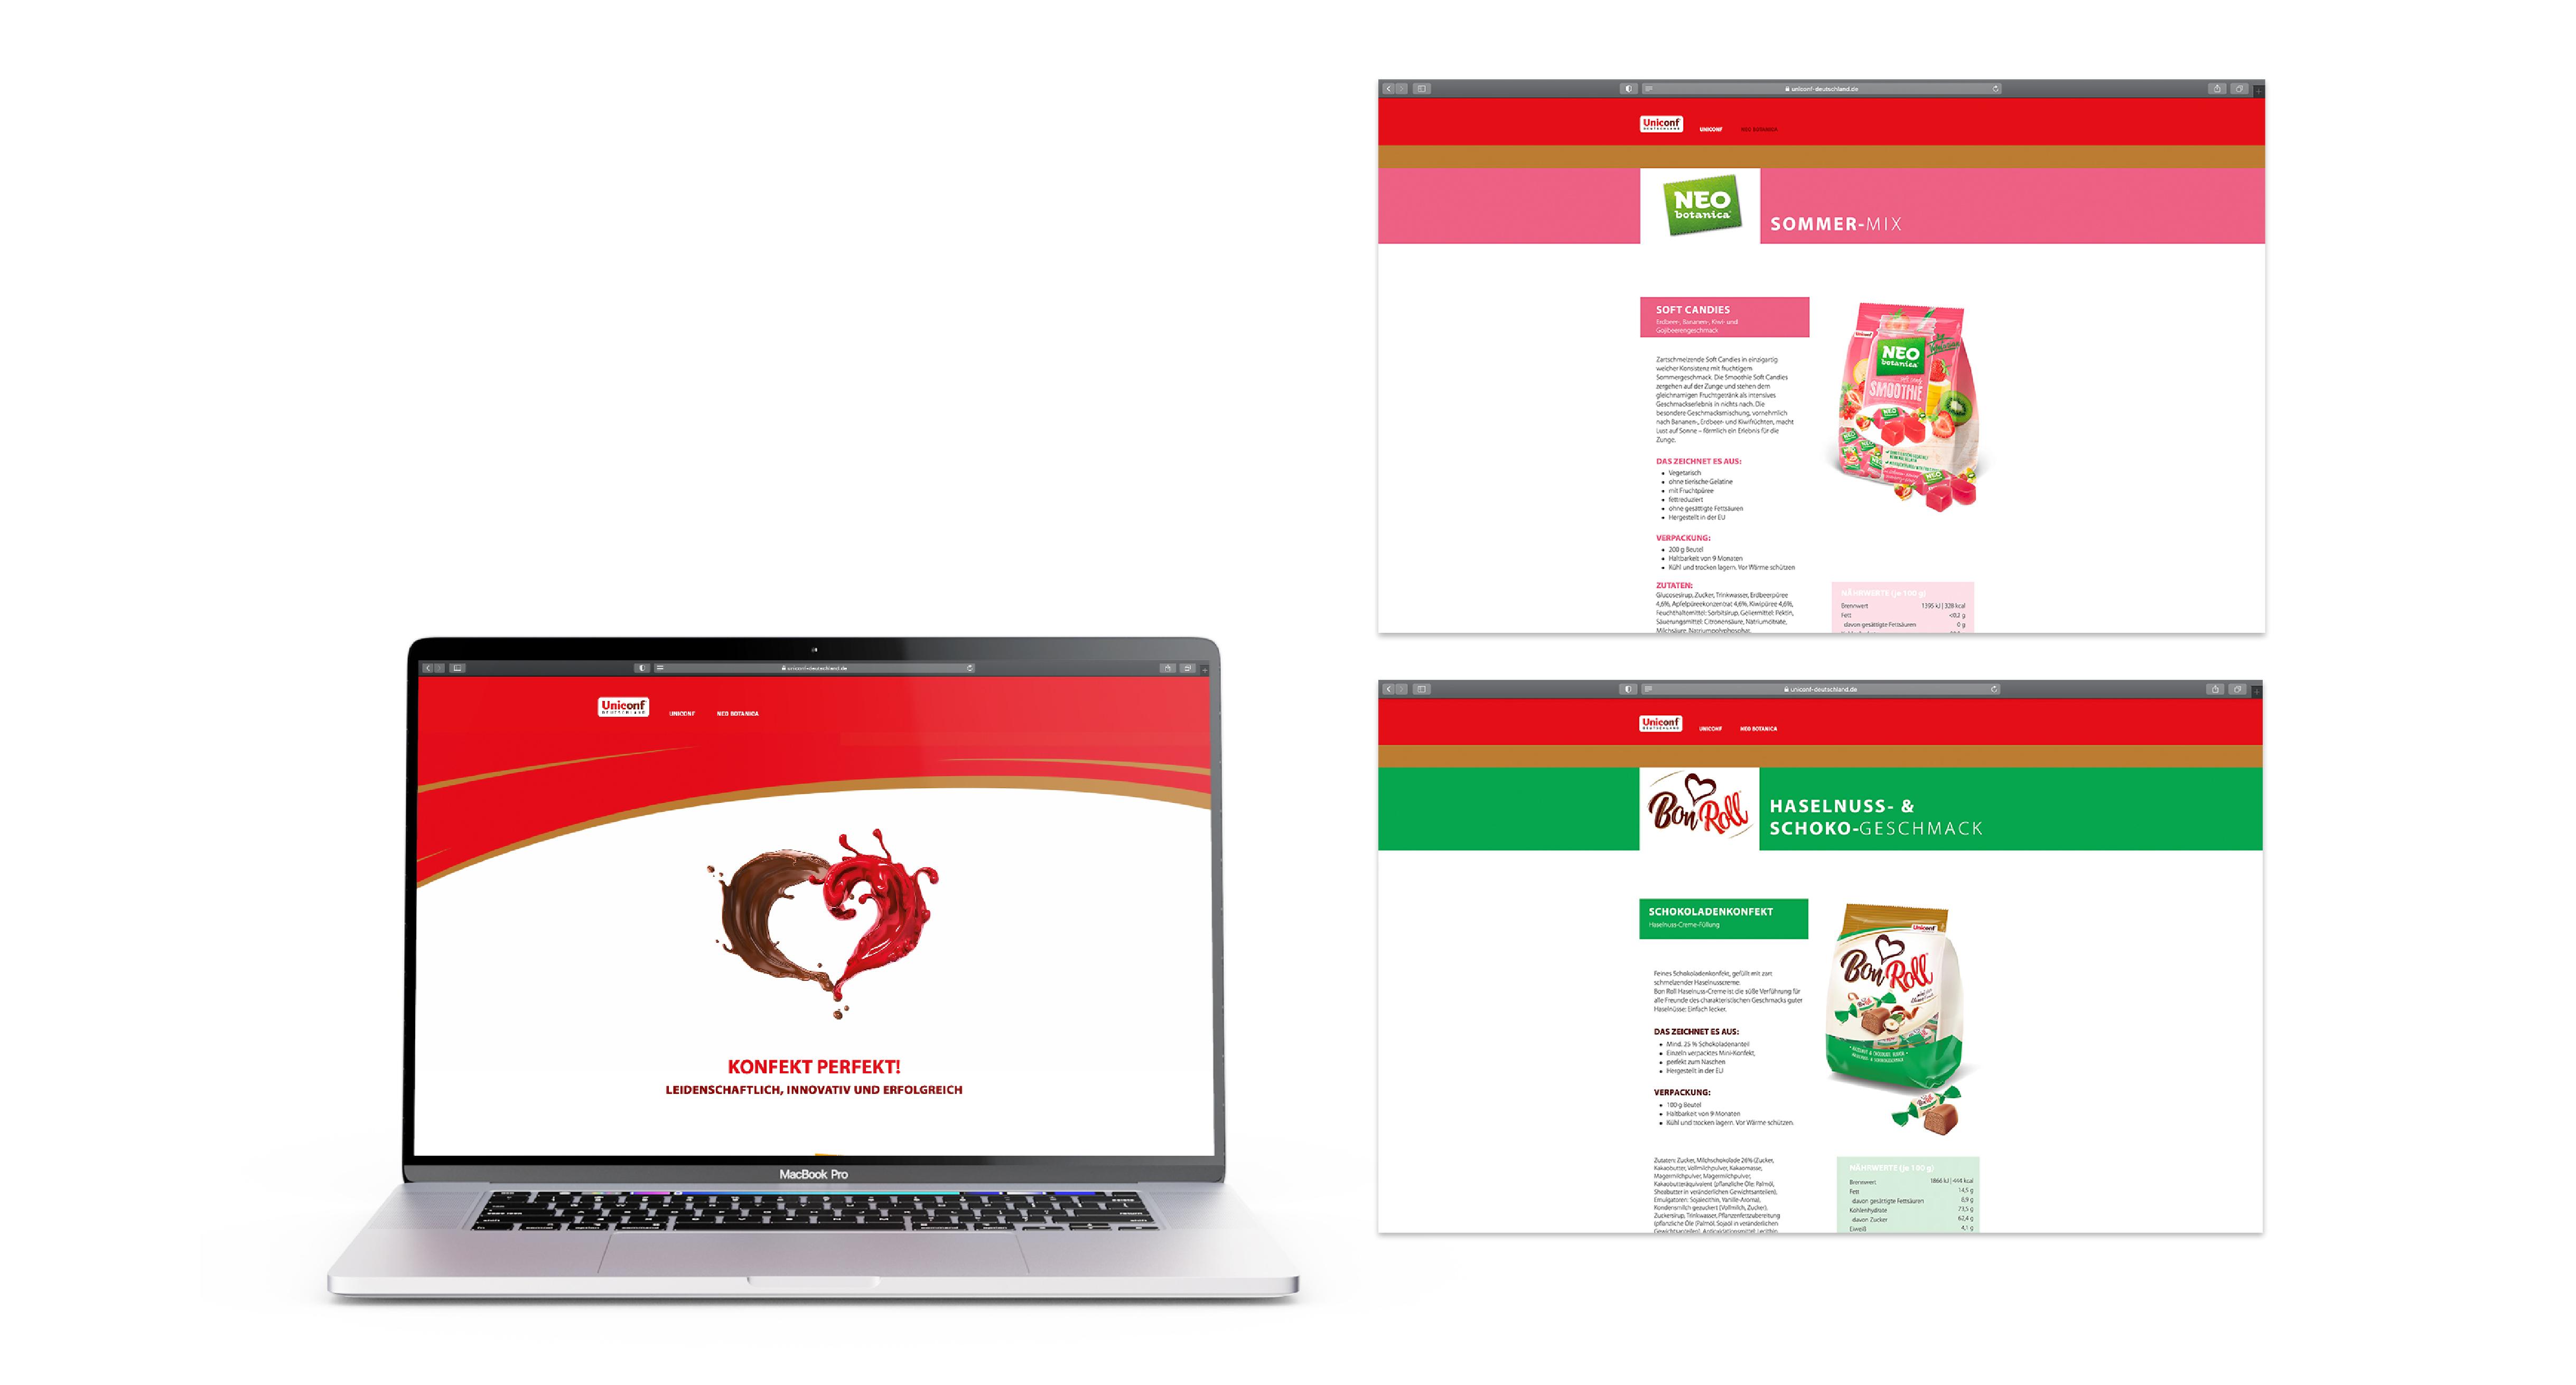 UNI_Webseite_MacBook